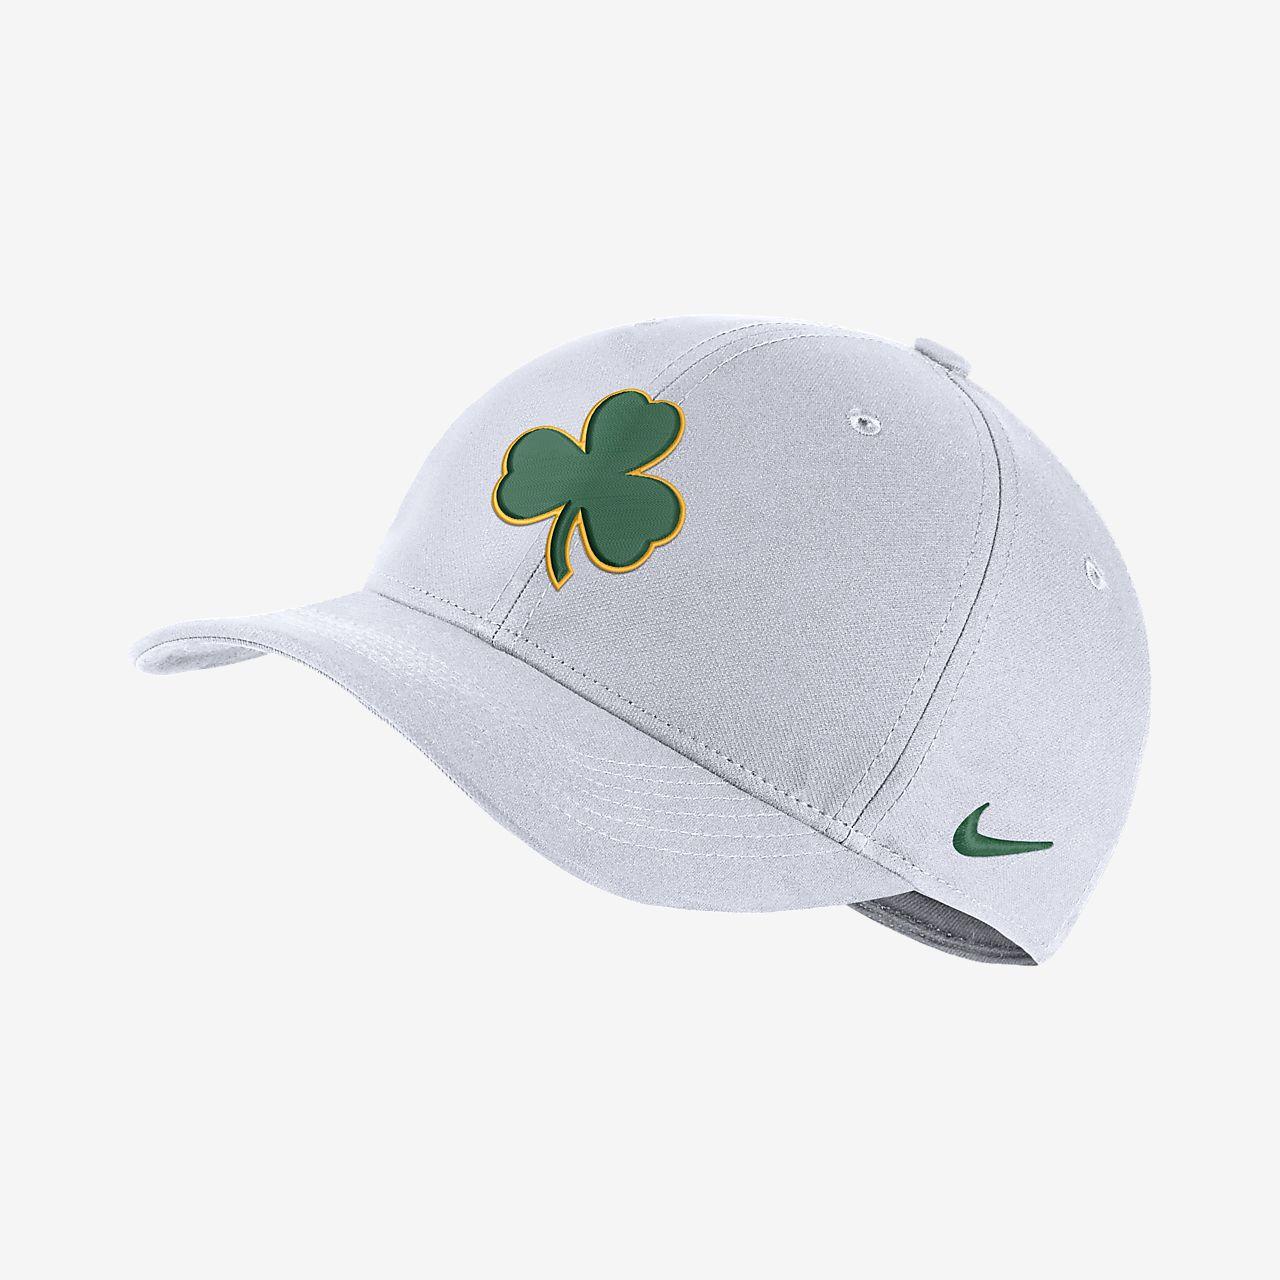 Gorra de la NBA Boston Celtics City Edition Nike AeroBill Classic99 ... 4bb8bfb04b0